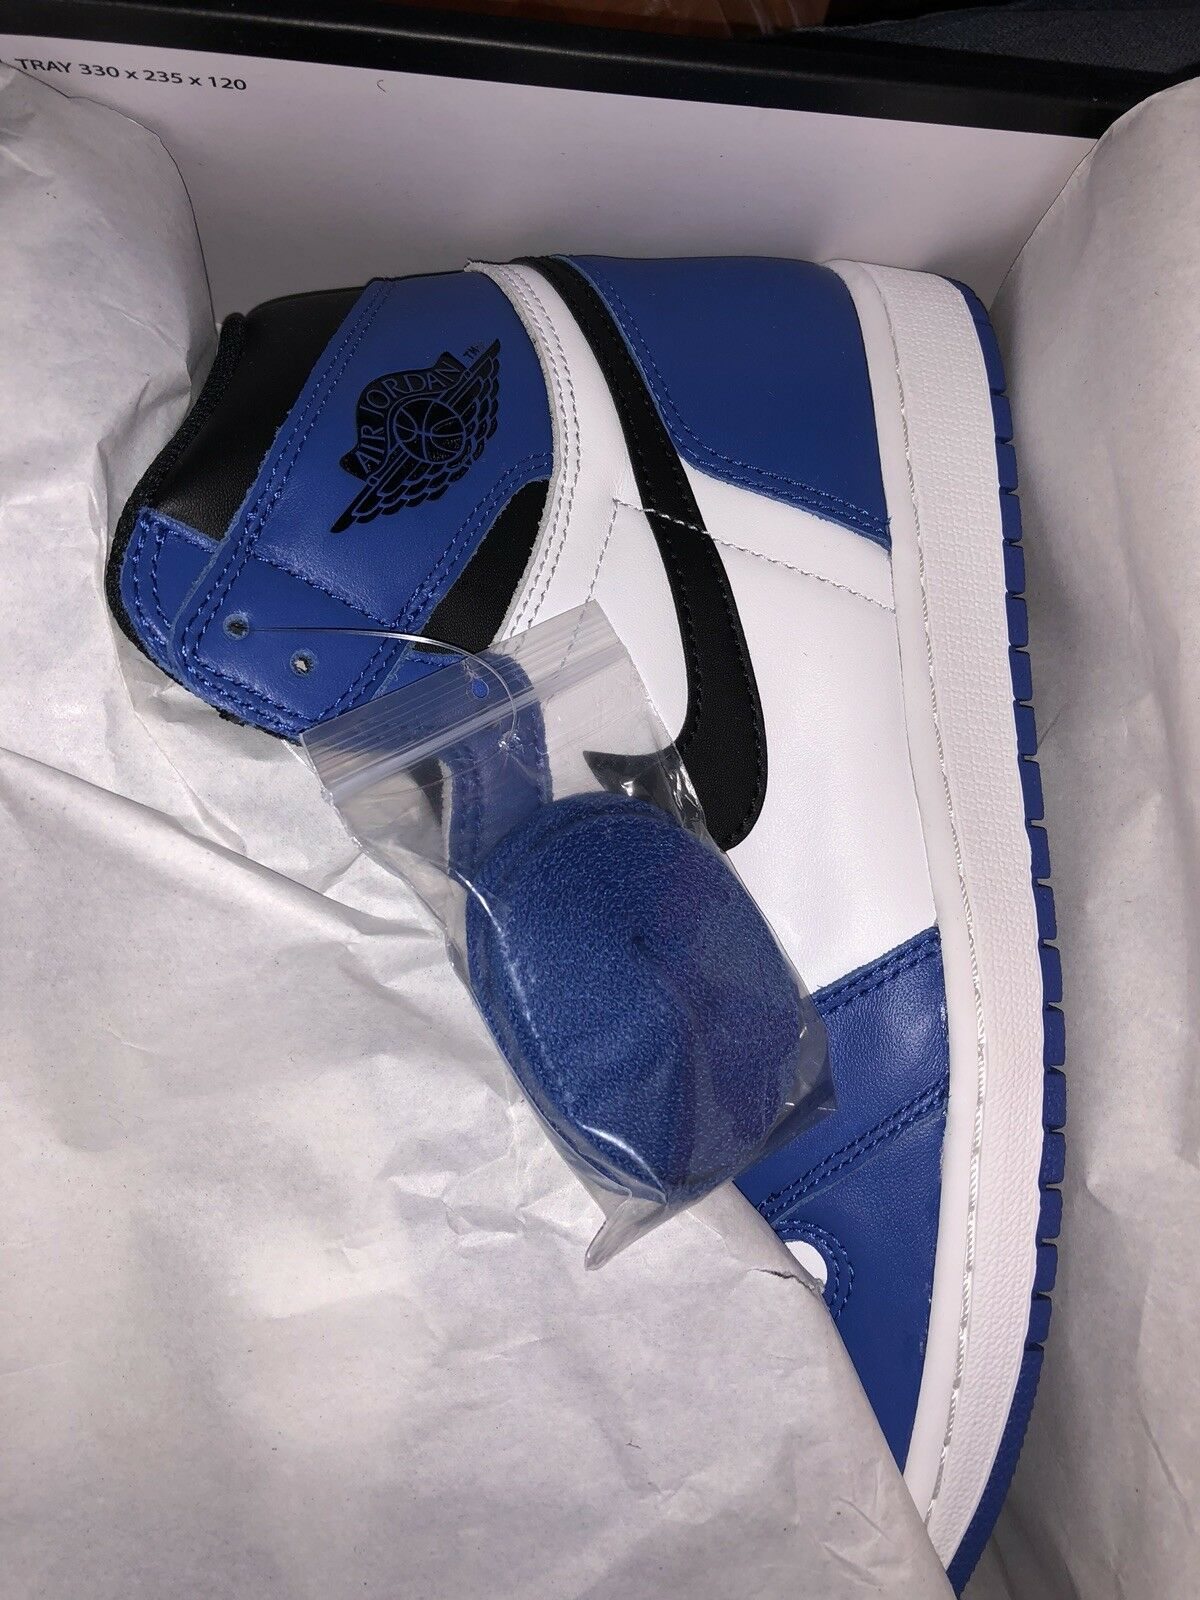 6fcddeecbb NEW DS 2018 Nike Air Jordan 1 Retro High OG Game Royal Alternate 555088-403  noqrib7169-Athletic Shoes